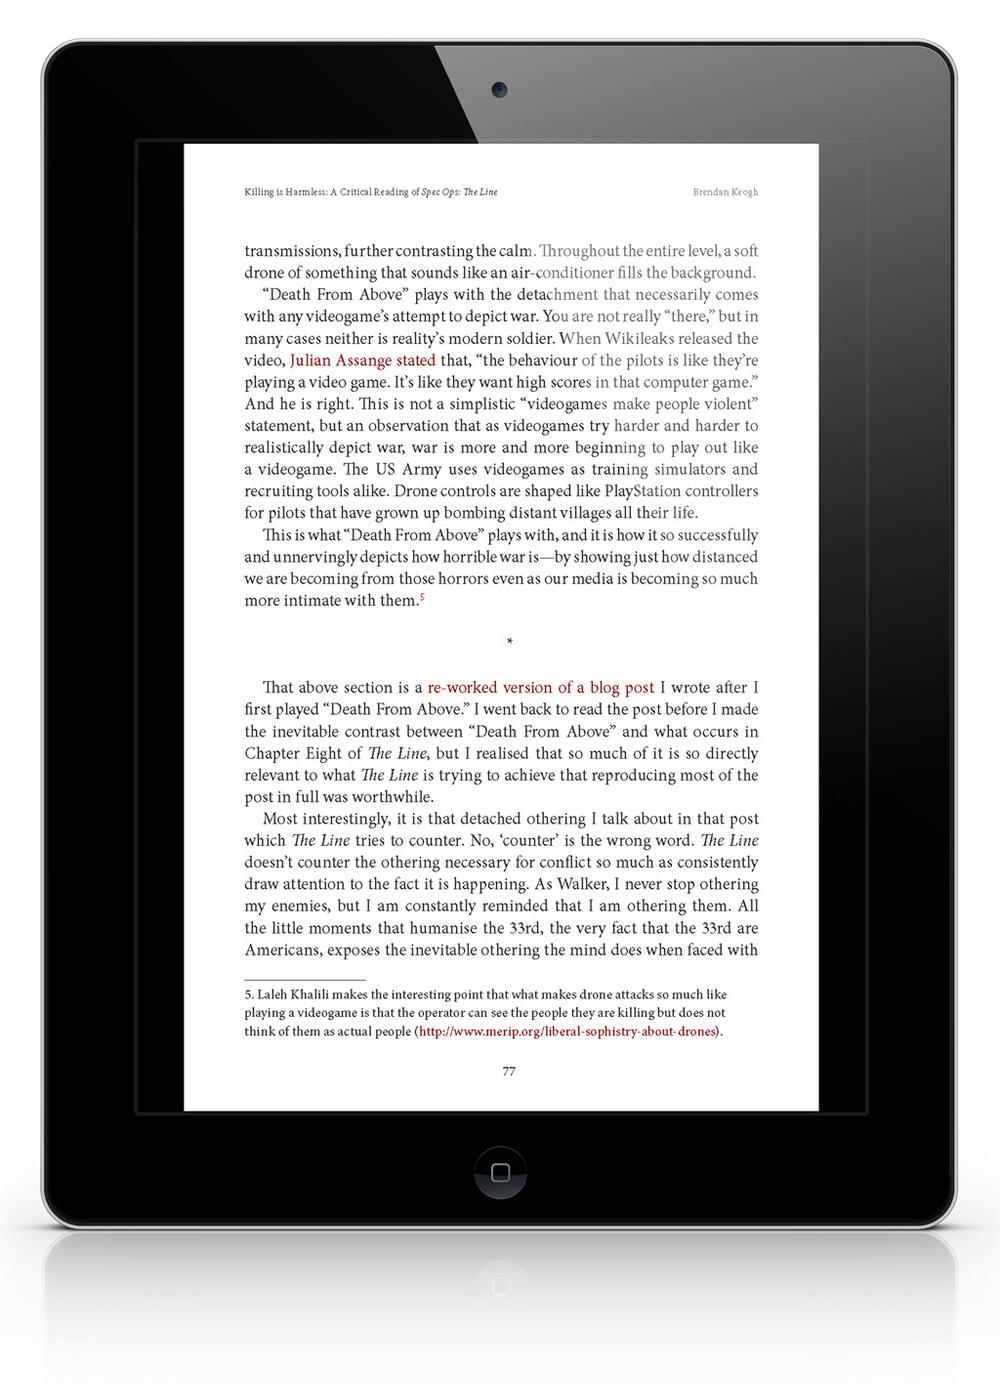 iPad-Retina-Display-Mockup4.jpg